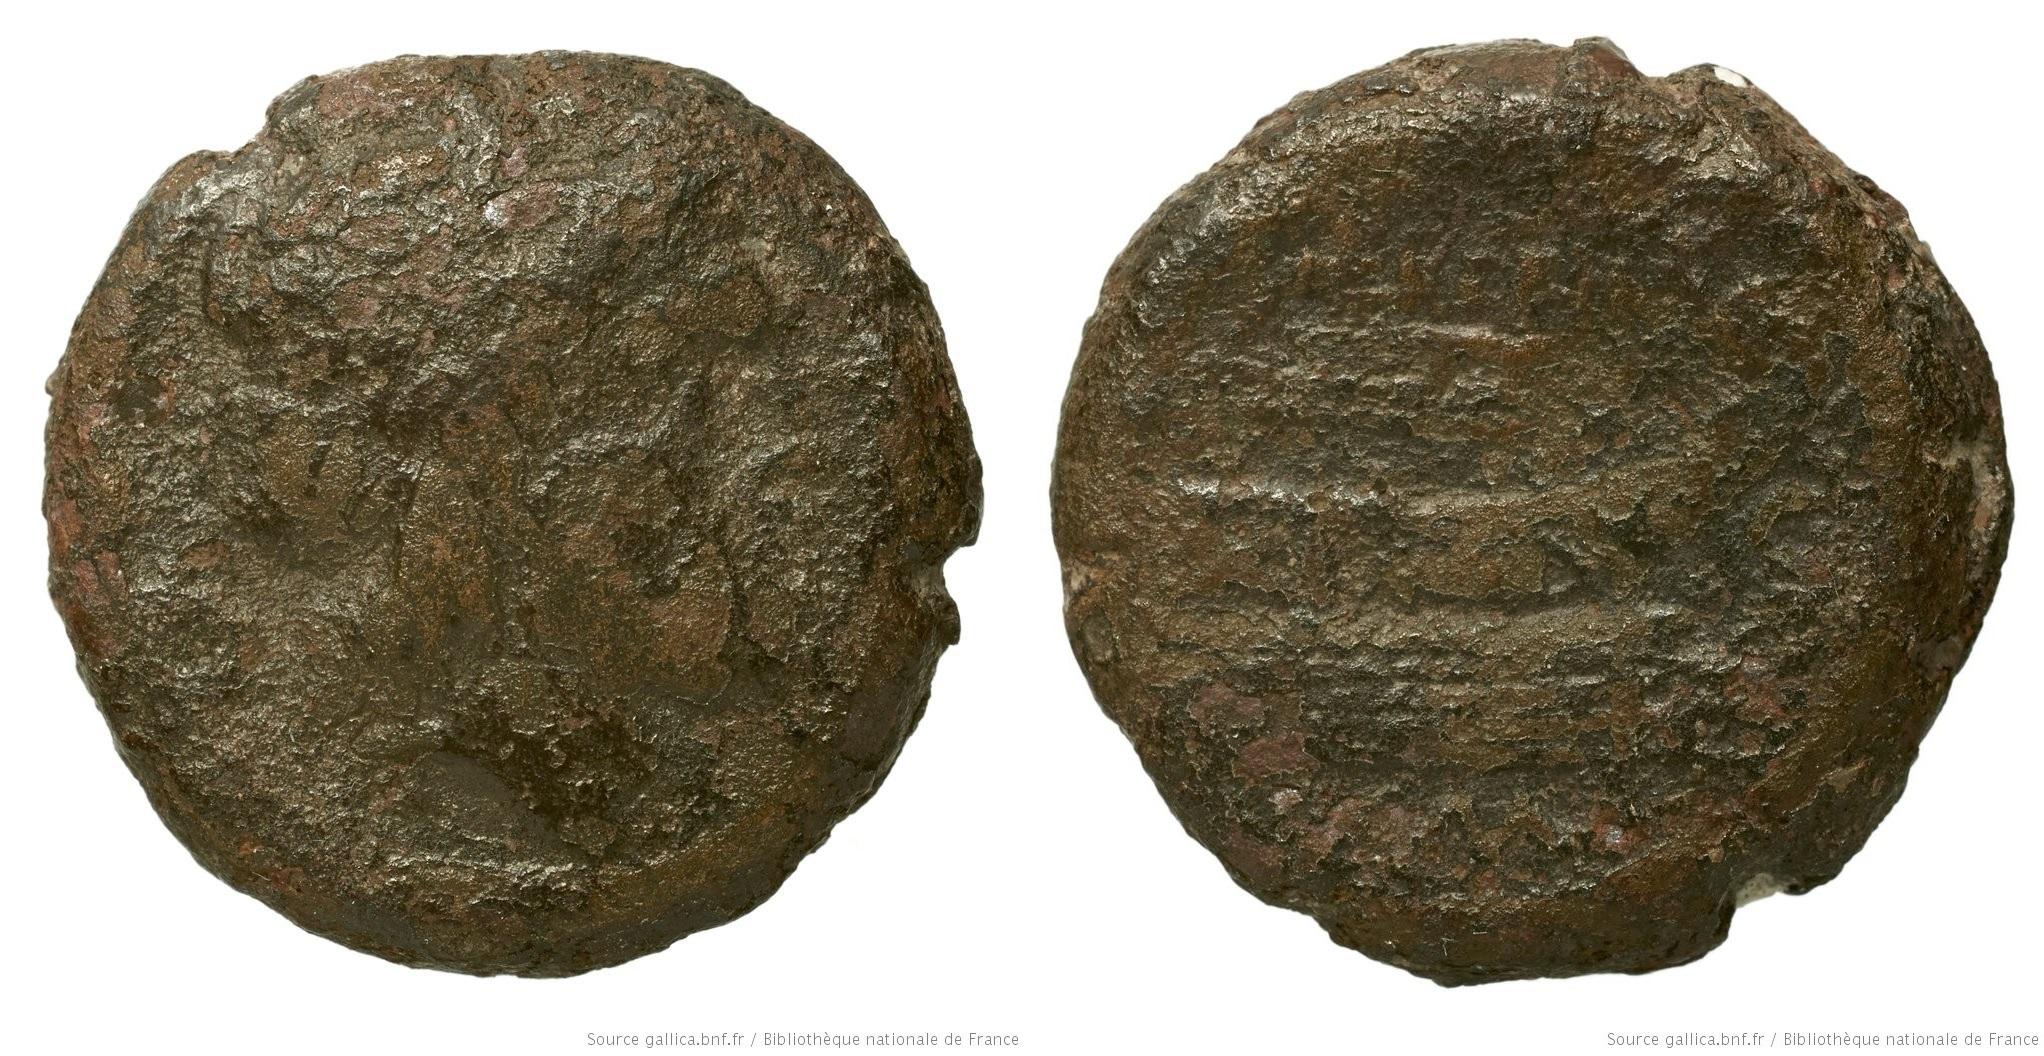 1126HE – Semis Herennia – Marcus Herennius